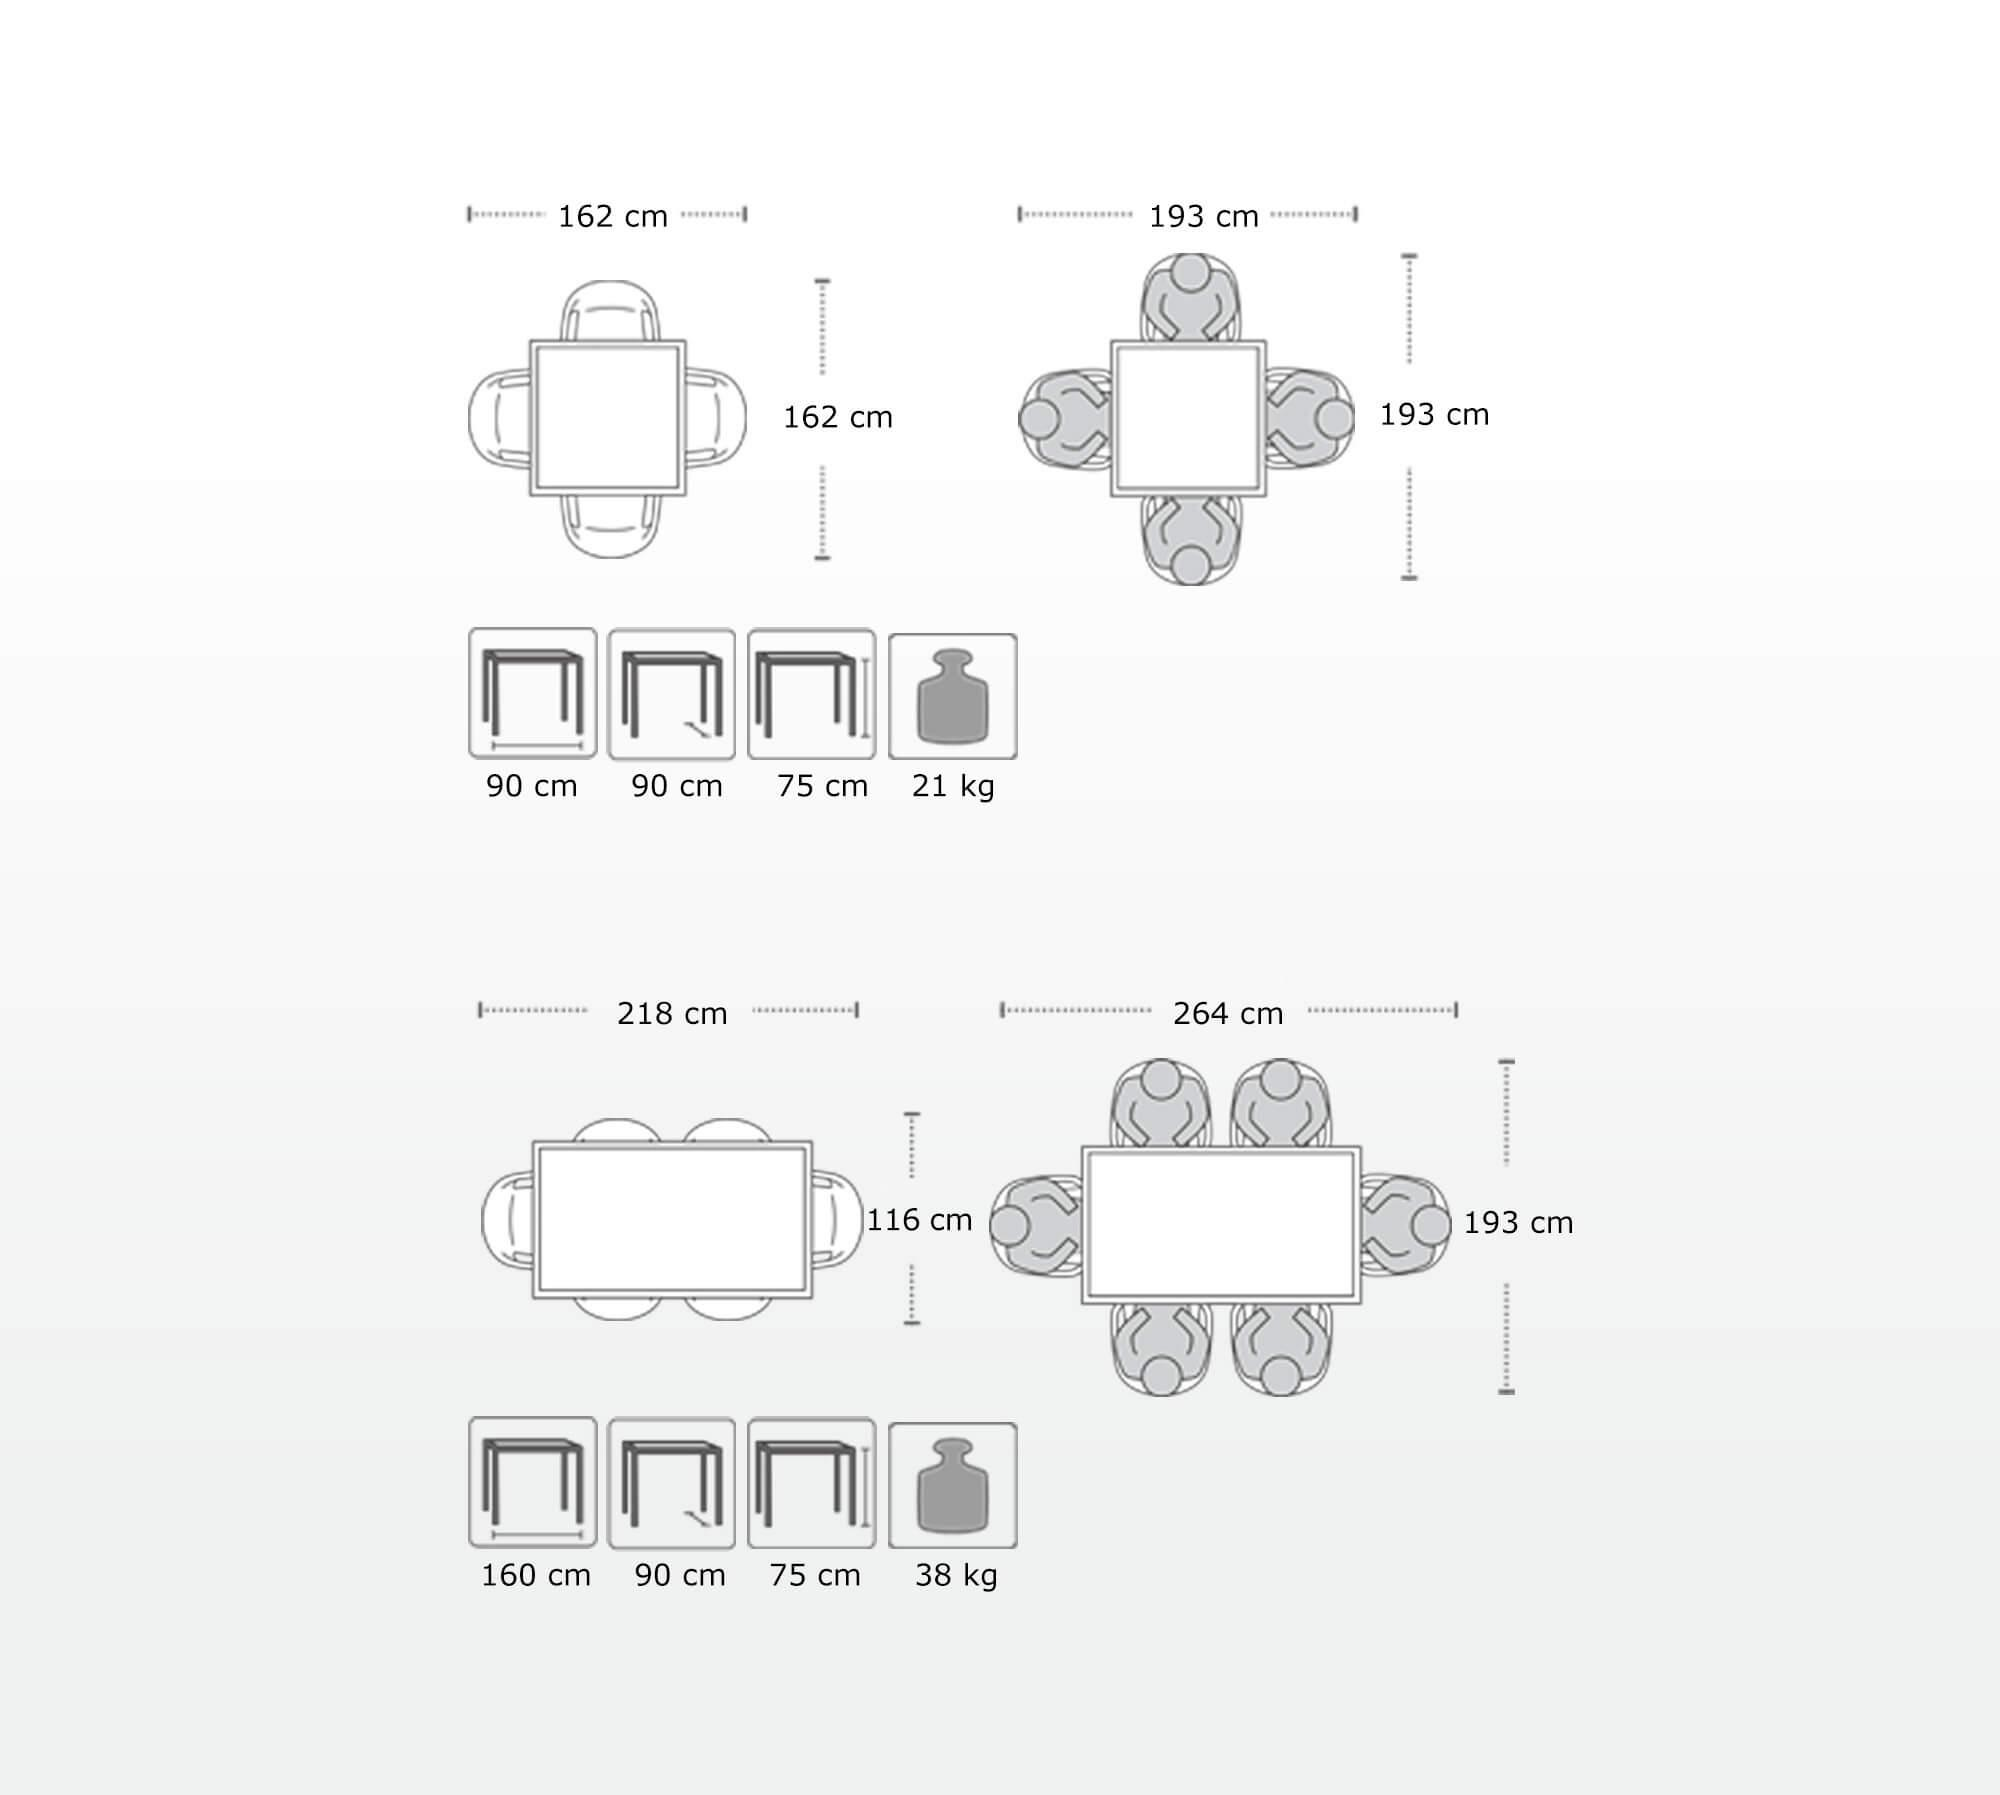 Dimensions of LECHUZA furniture